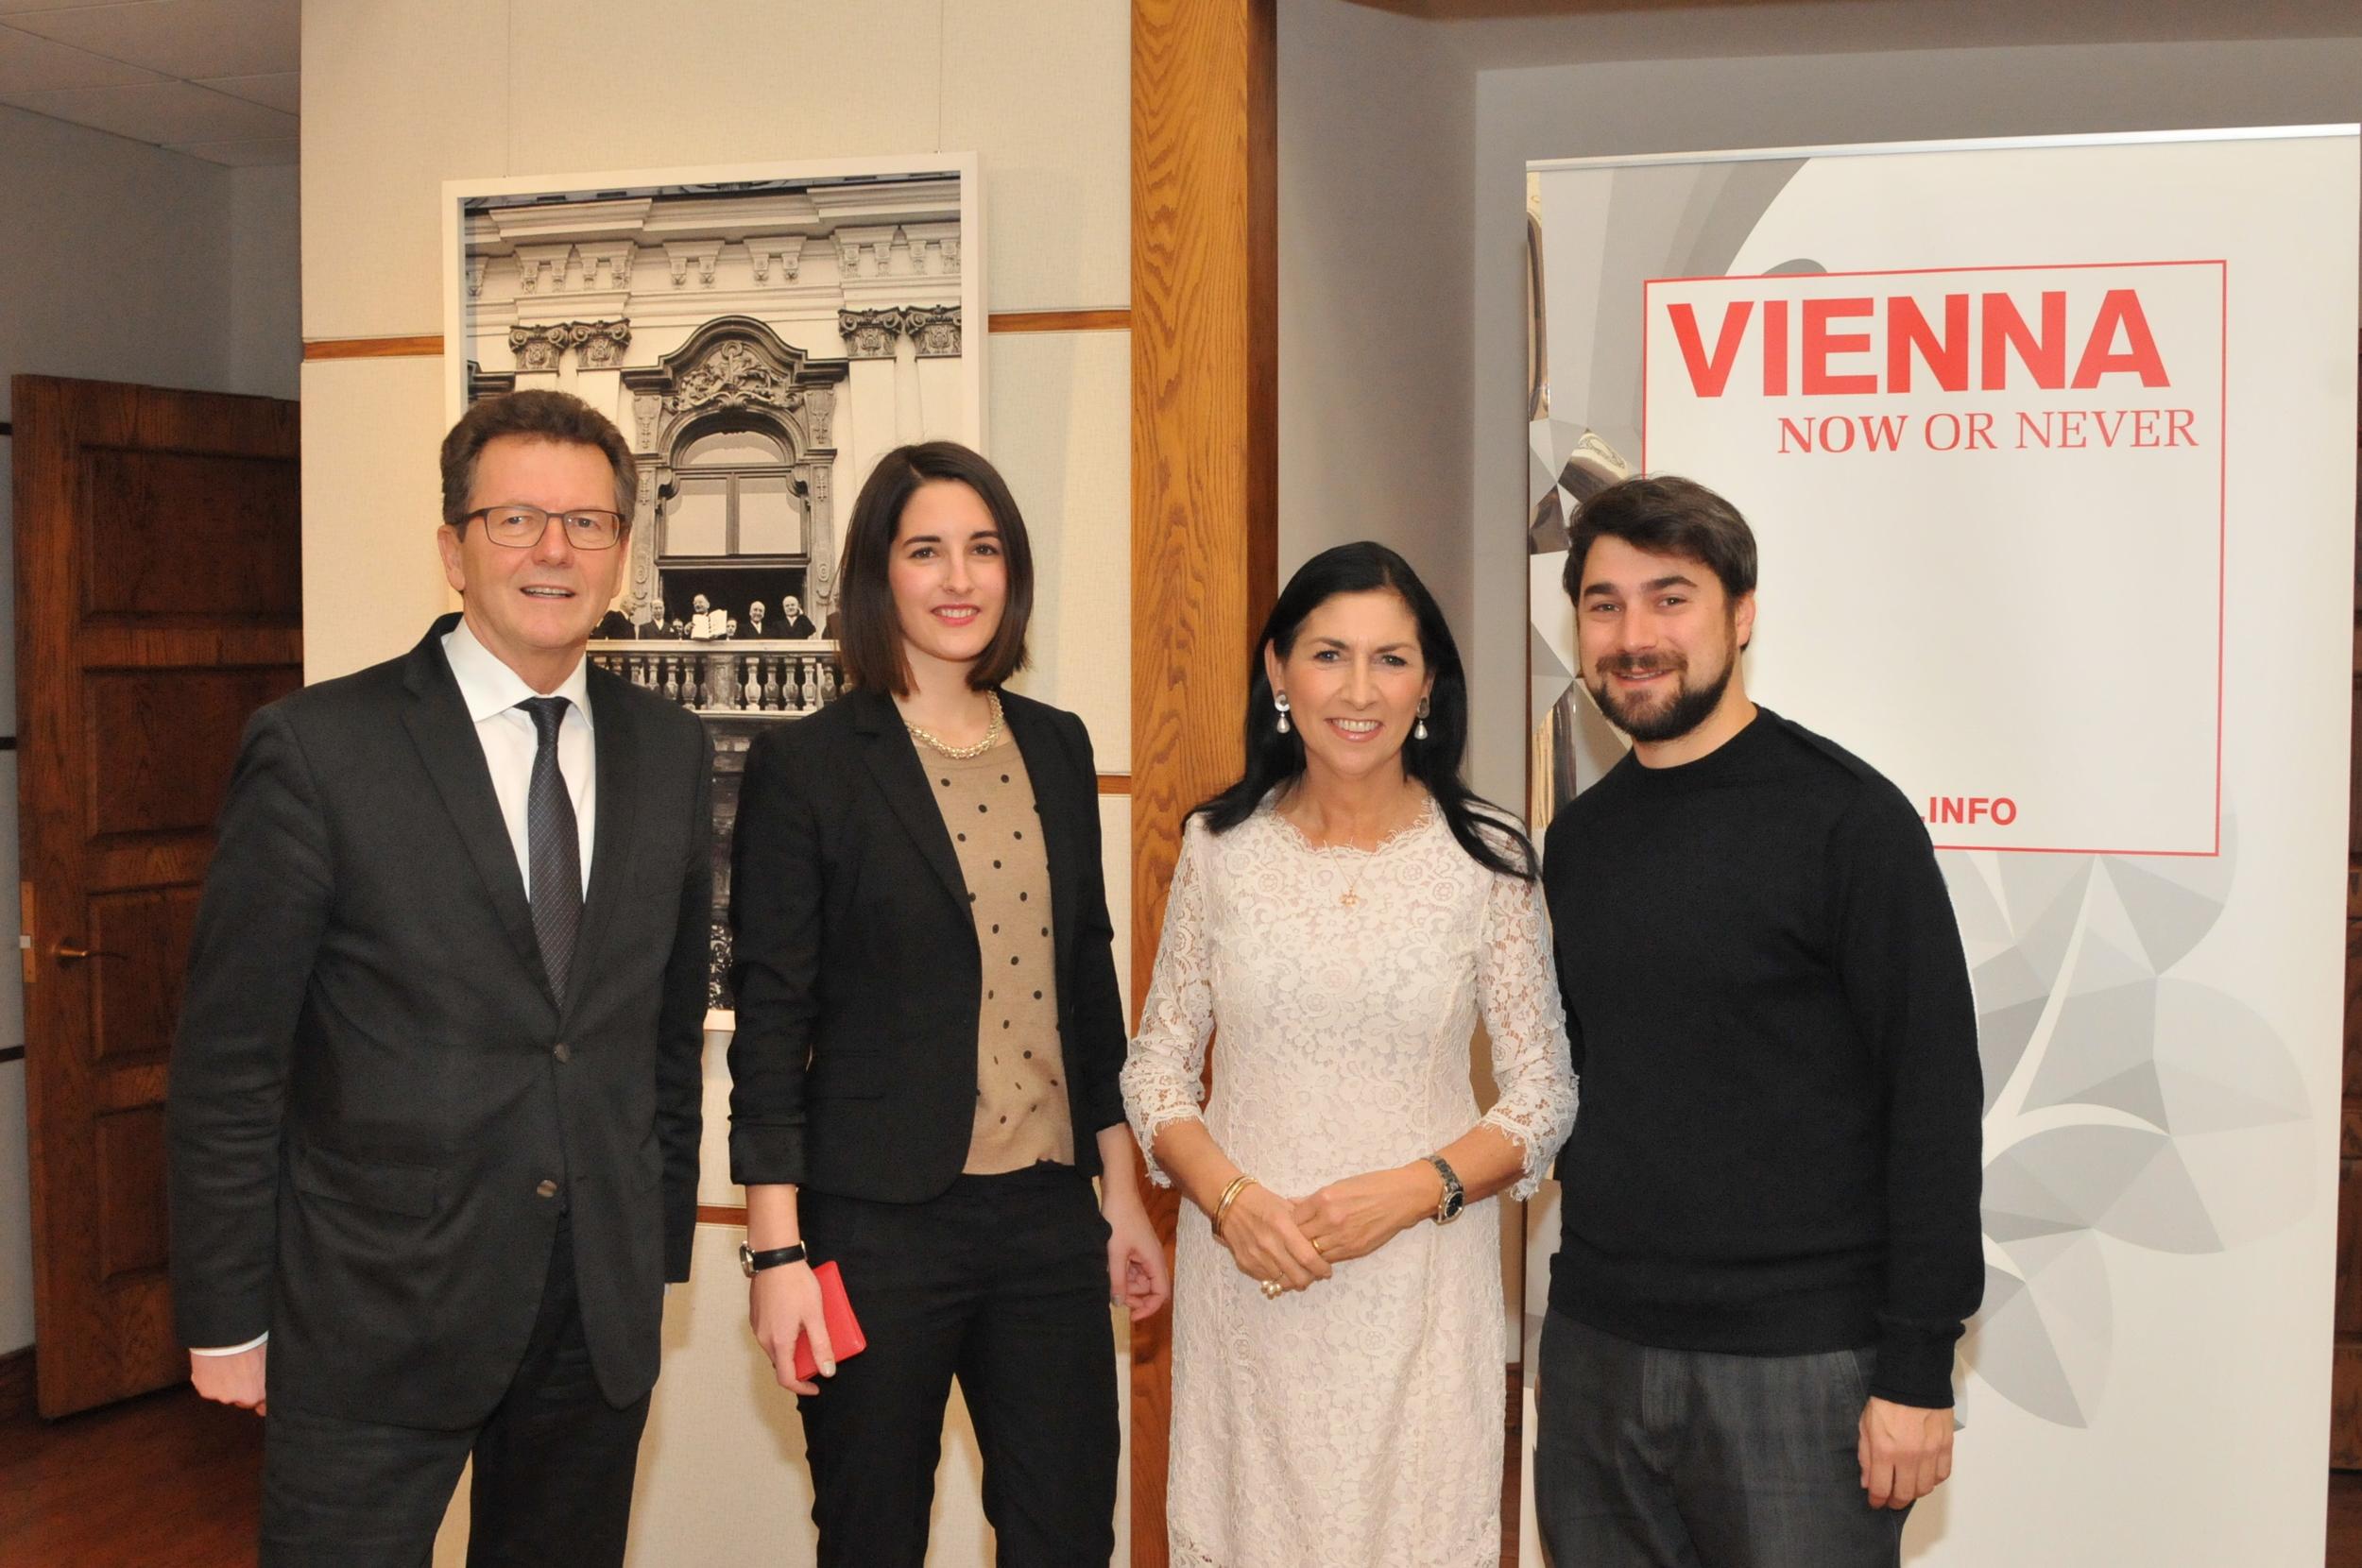 Amb. Wolfgang Waldner, Helena Hartlauer ( Vienna.info ), Danielle Spera, Andrew Mezvinsky